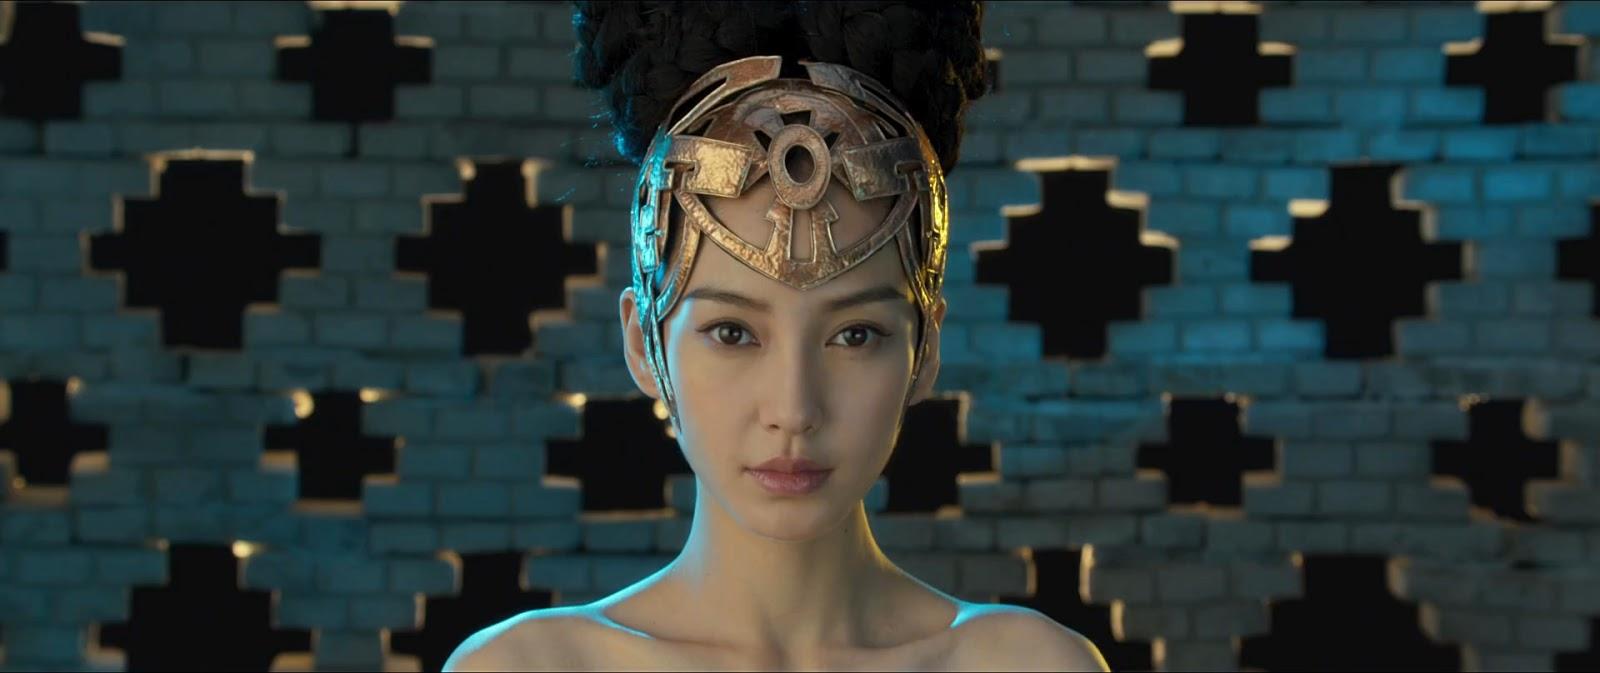 Screenshot League Of God (2016) Chinese BluRay 1080p 5 CH - www.uchiha-uzuma.com 01